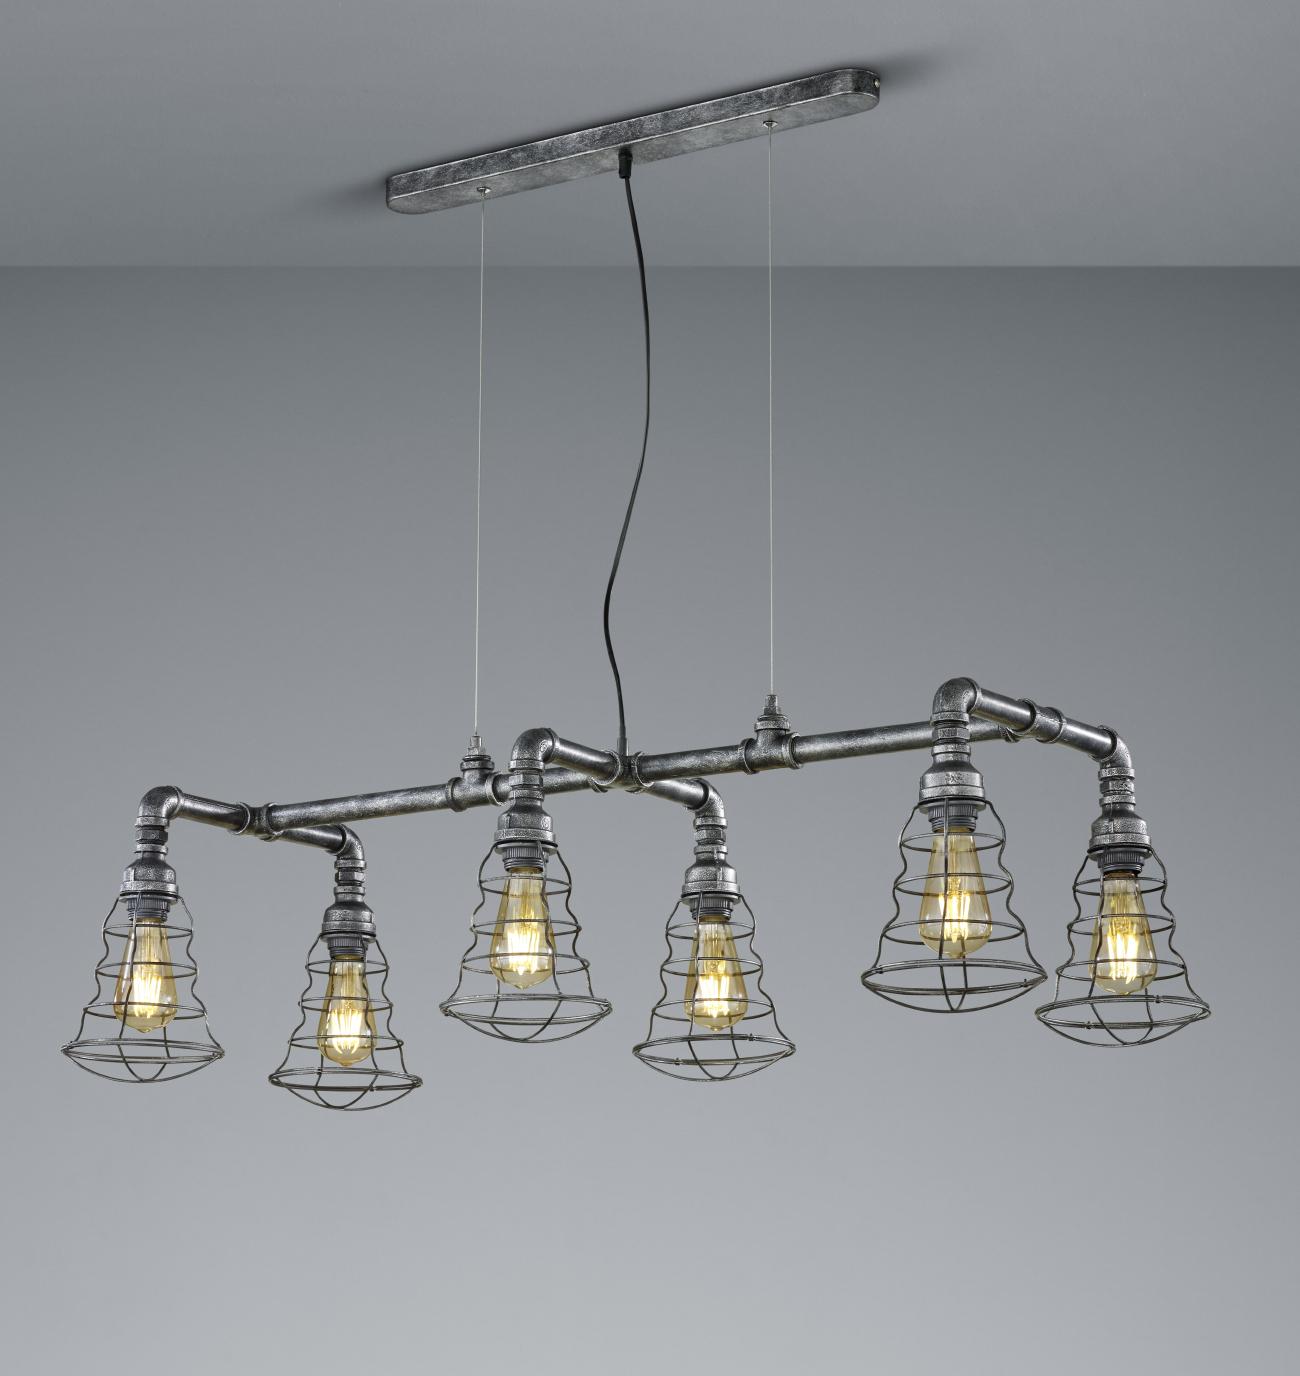 Angus Industrial Wall Light: Steampunk Lighting